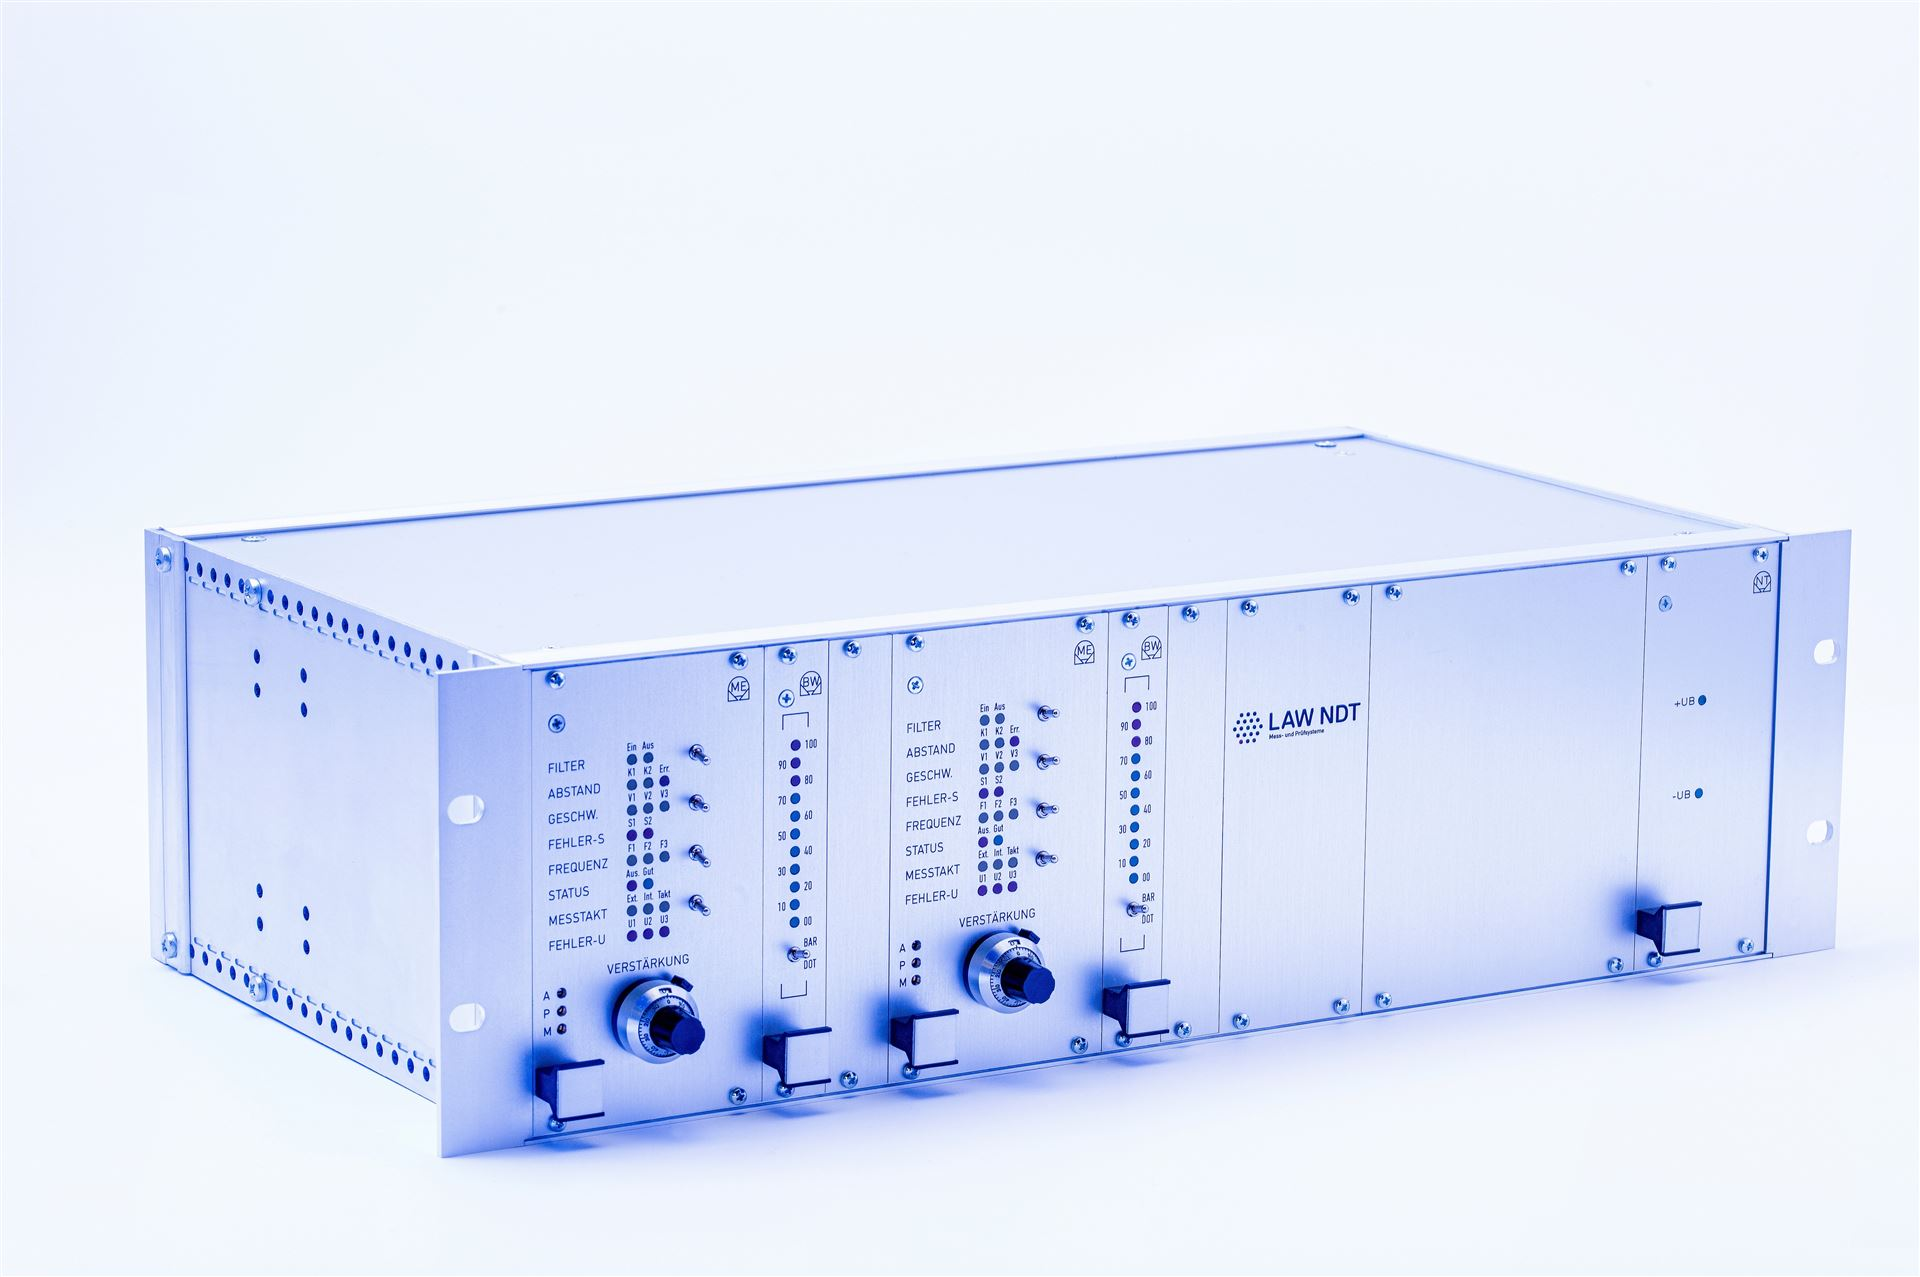 WRP Einbaugerät analog